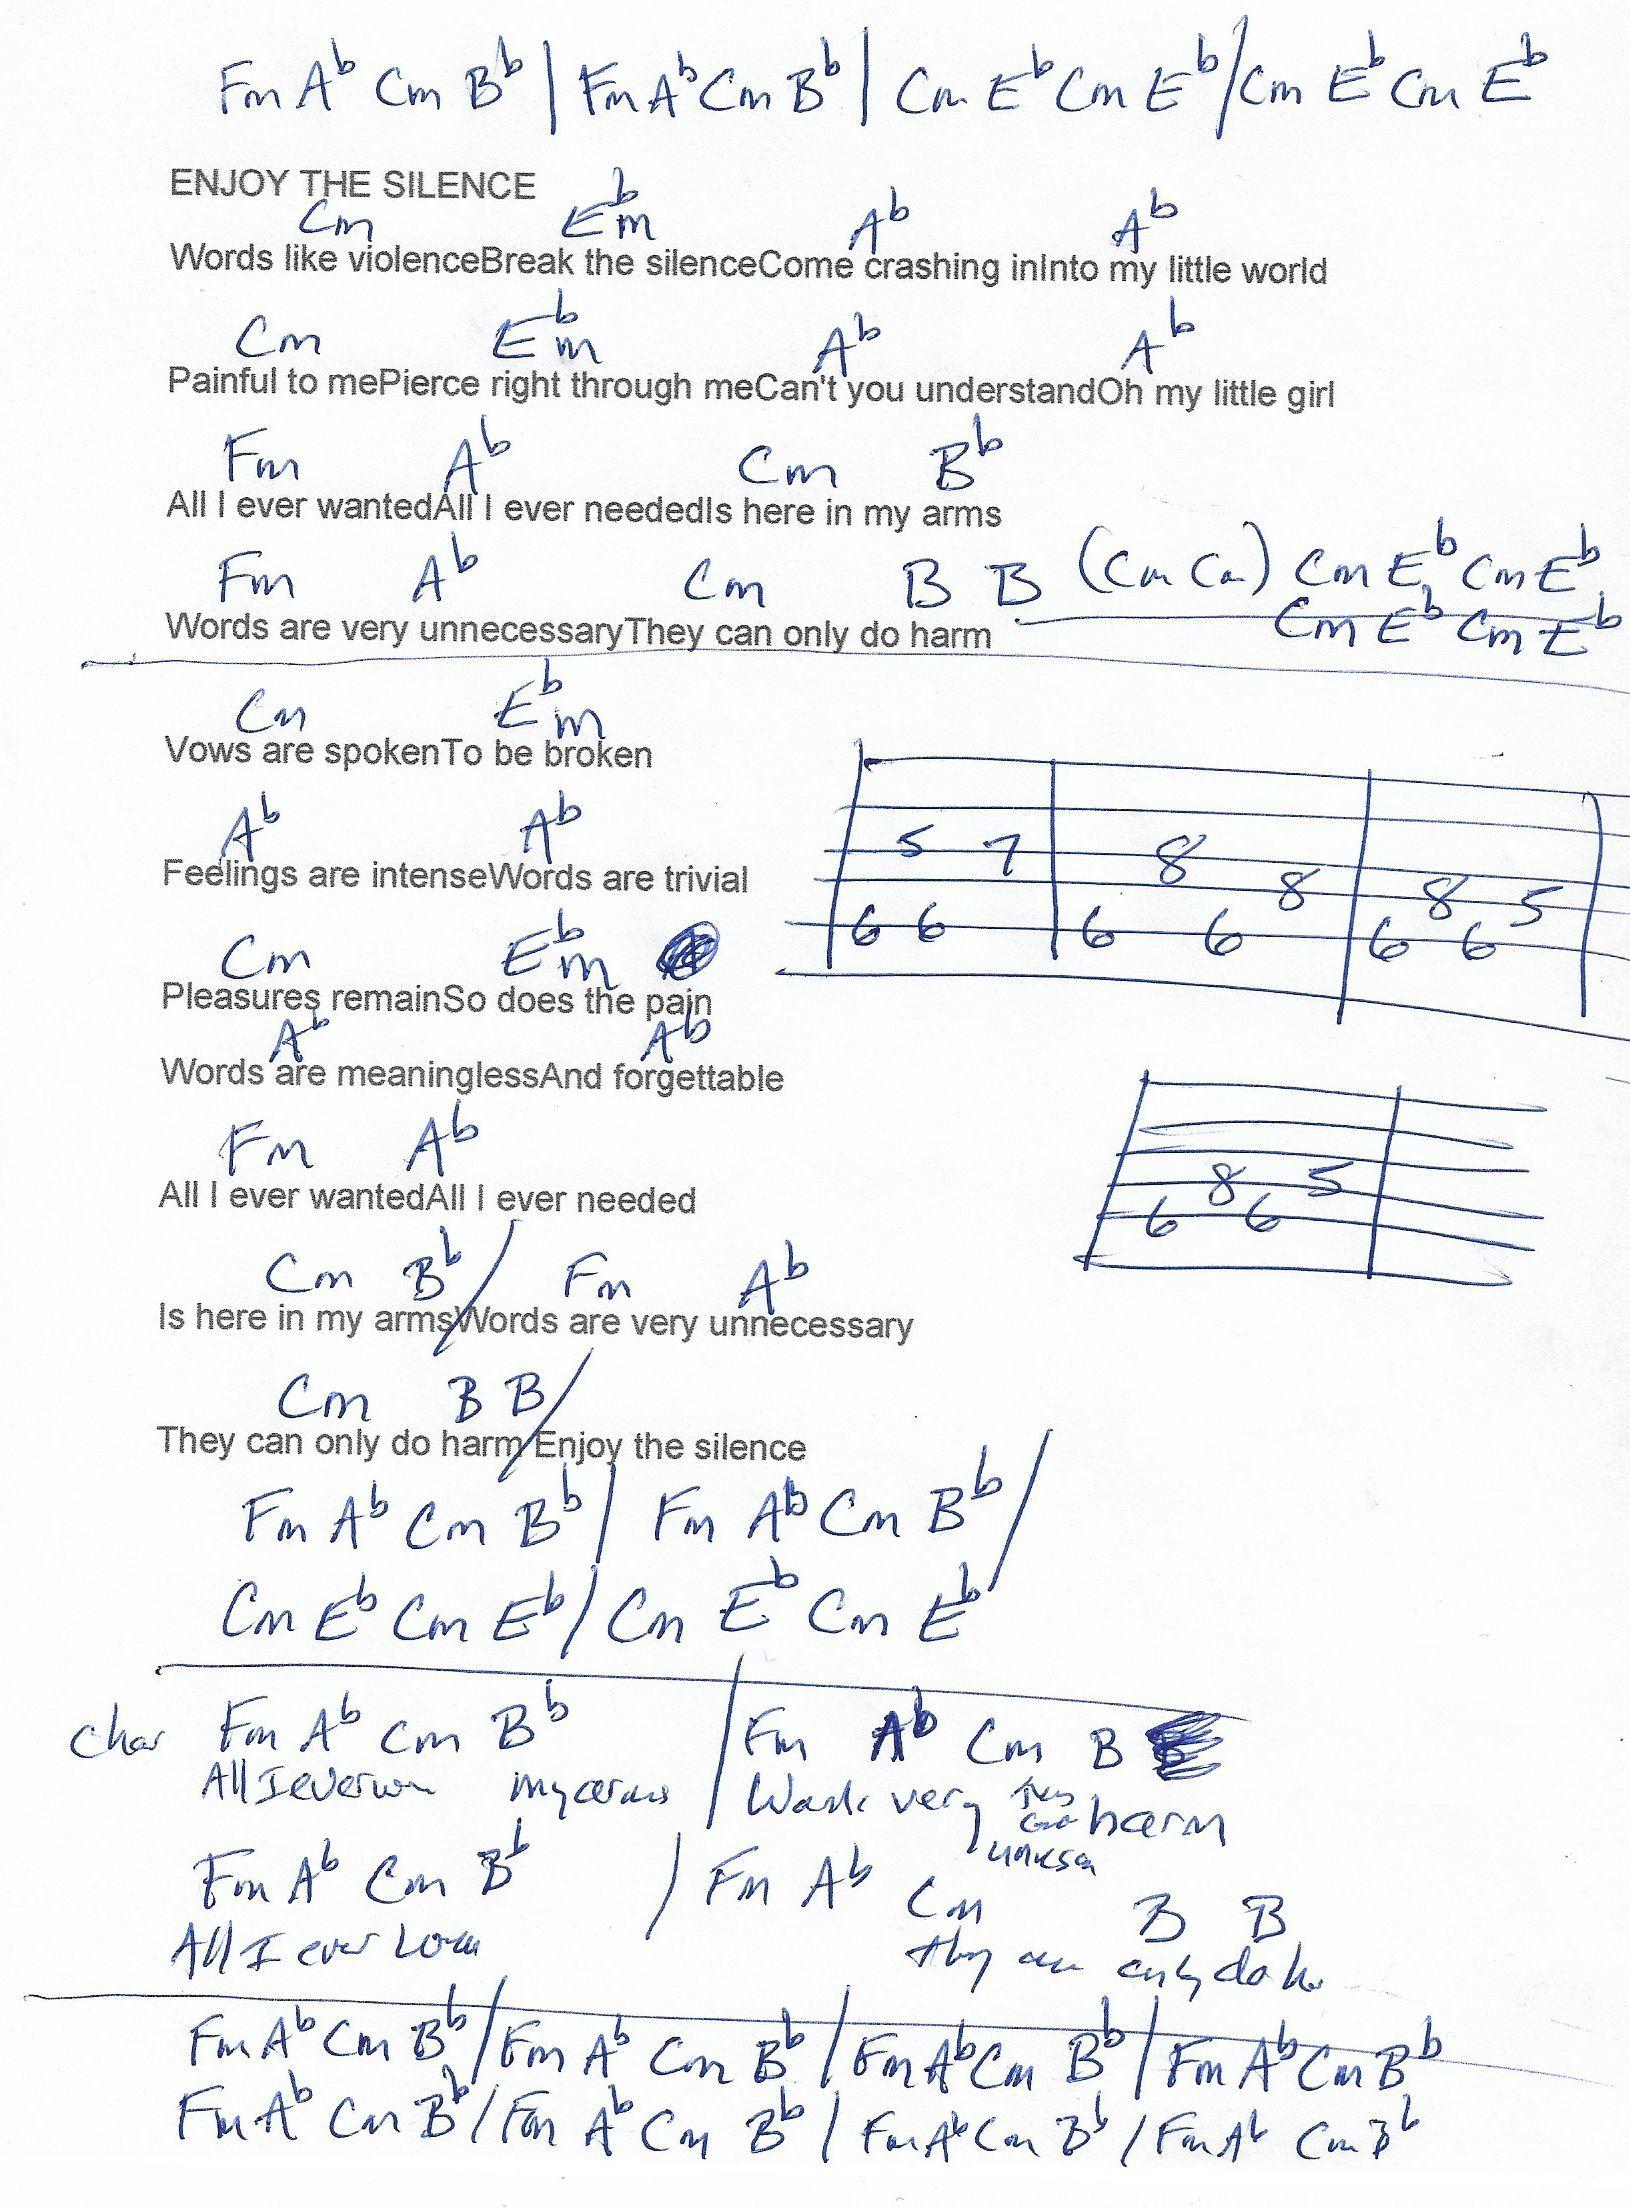 Enjoy the silence depeche mode guitar chord chart cm minor enjoy the silence depeche mode guitar chord chart cm minor real key hexwebz Images